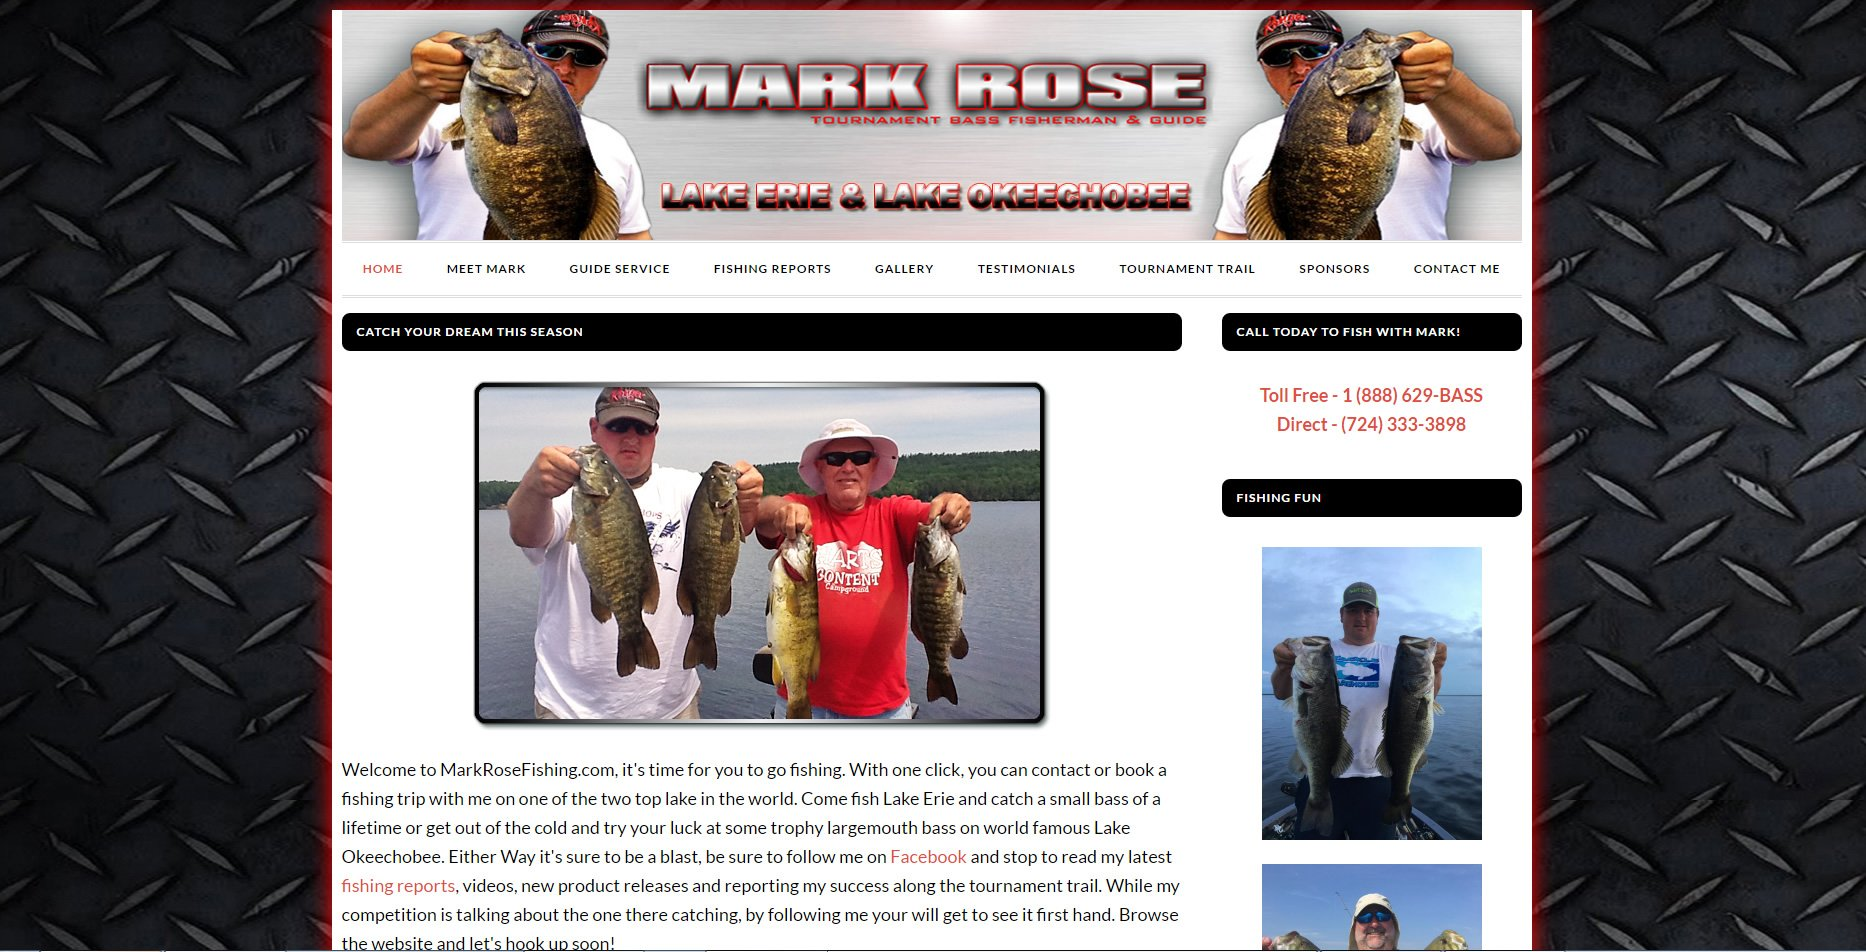 Mark Rose Fishing